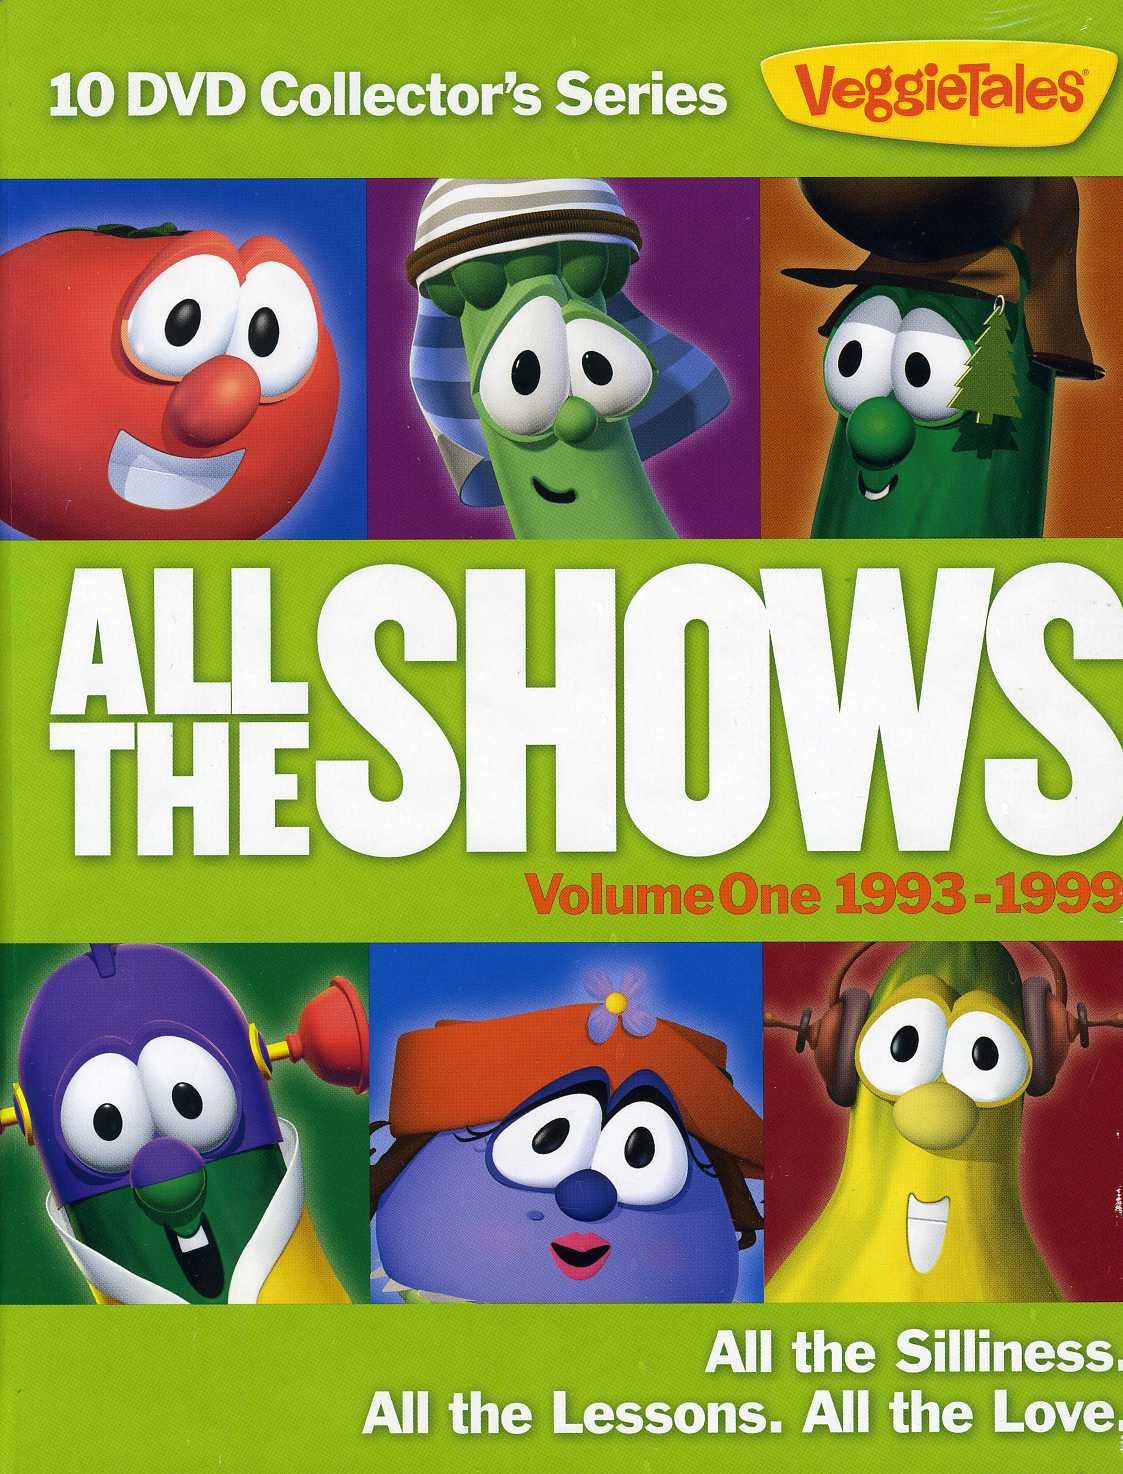 Veggietales: All the Shows (DVD)